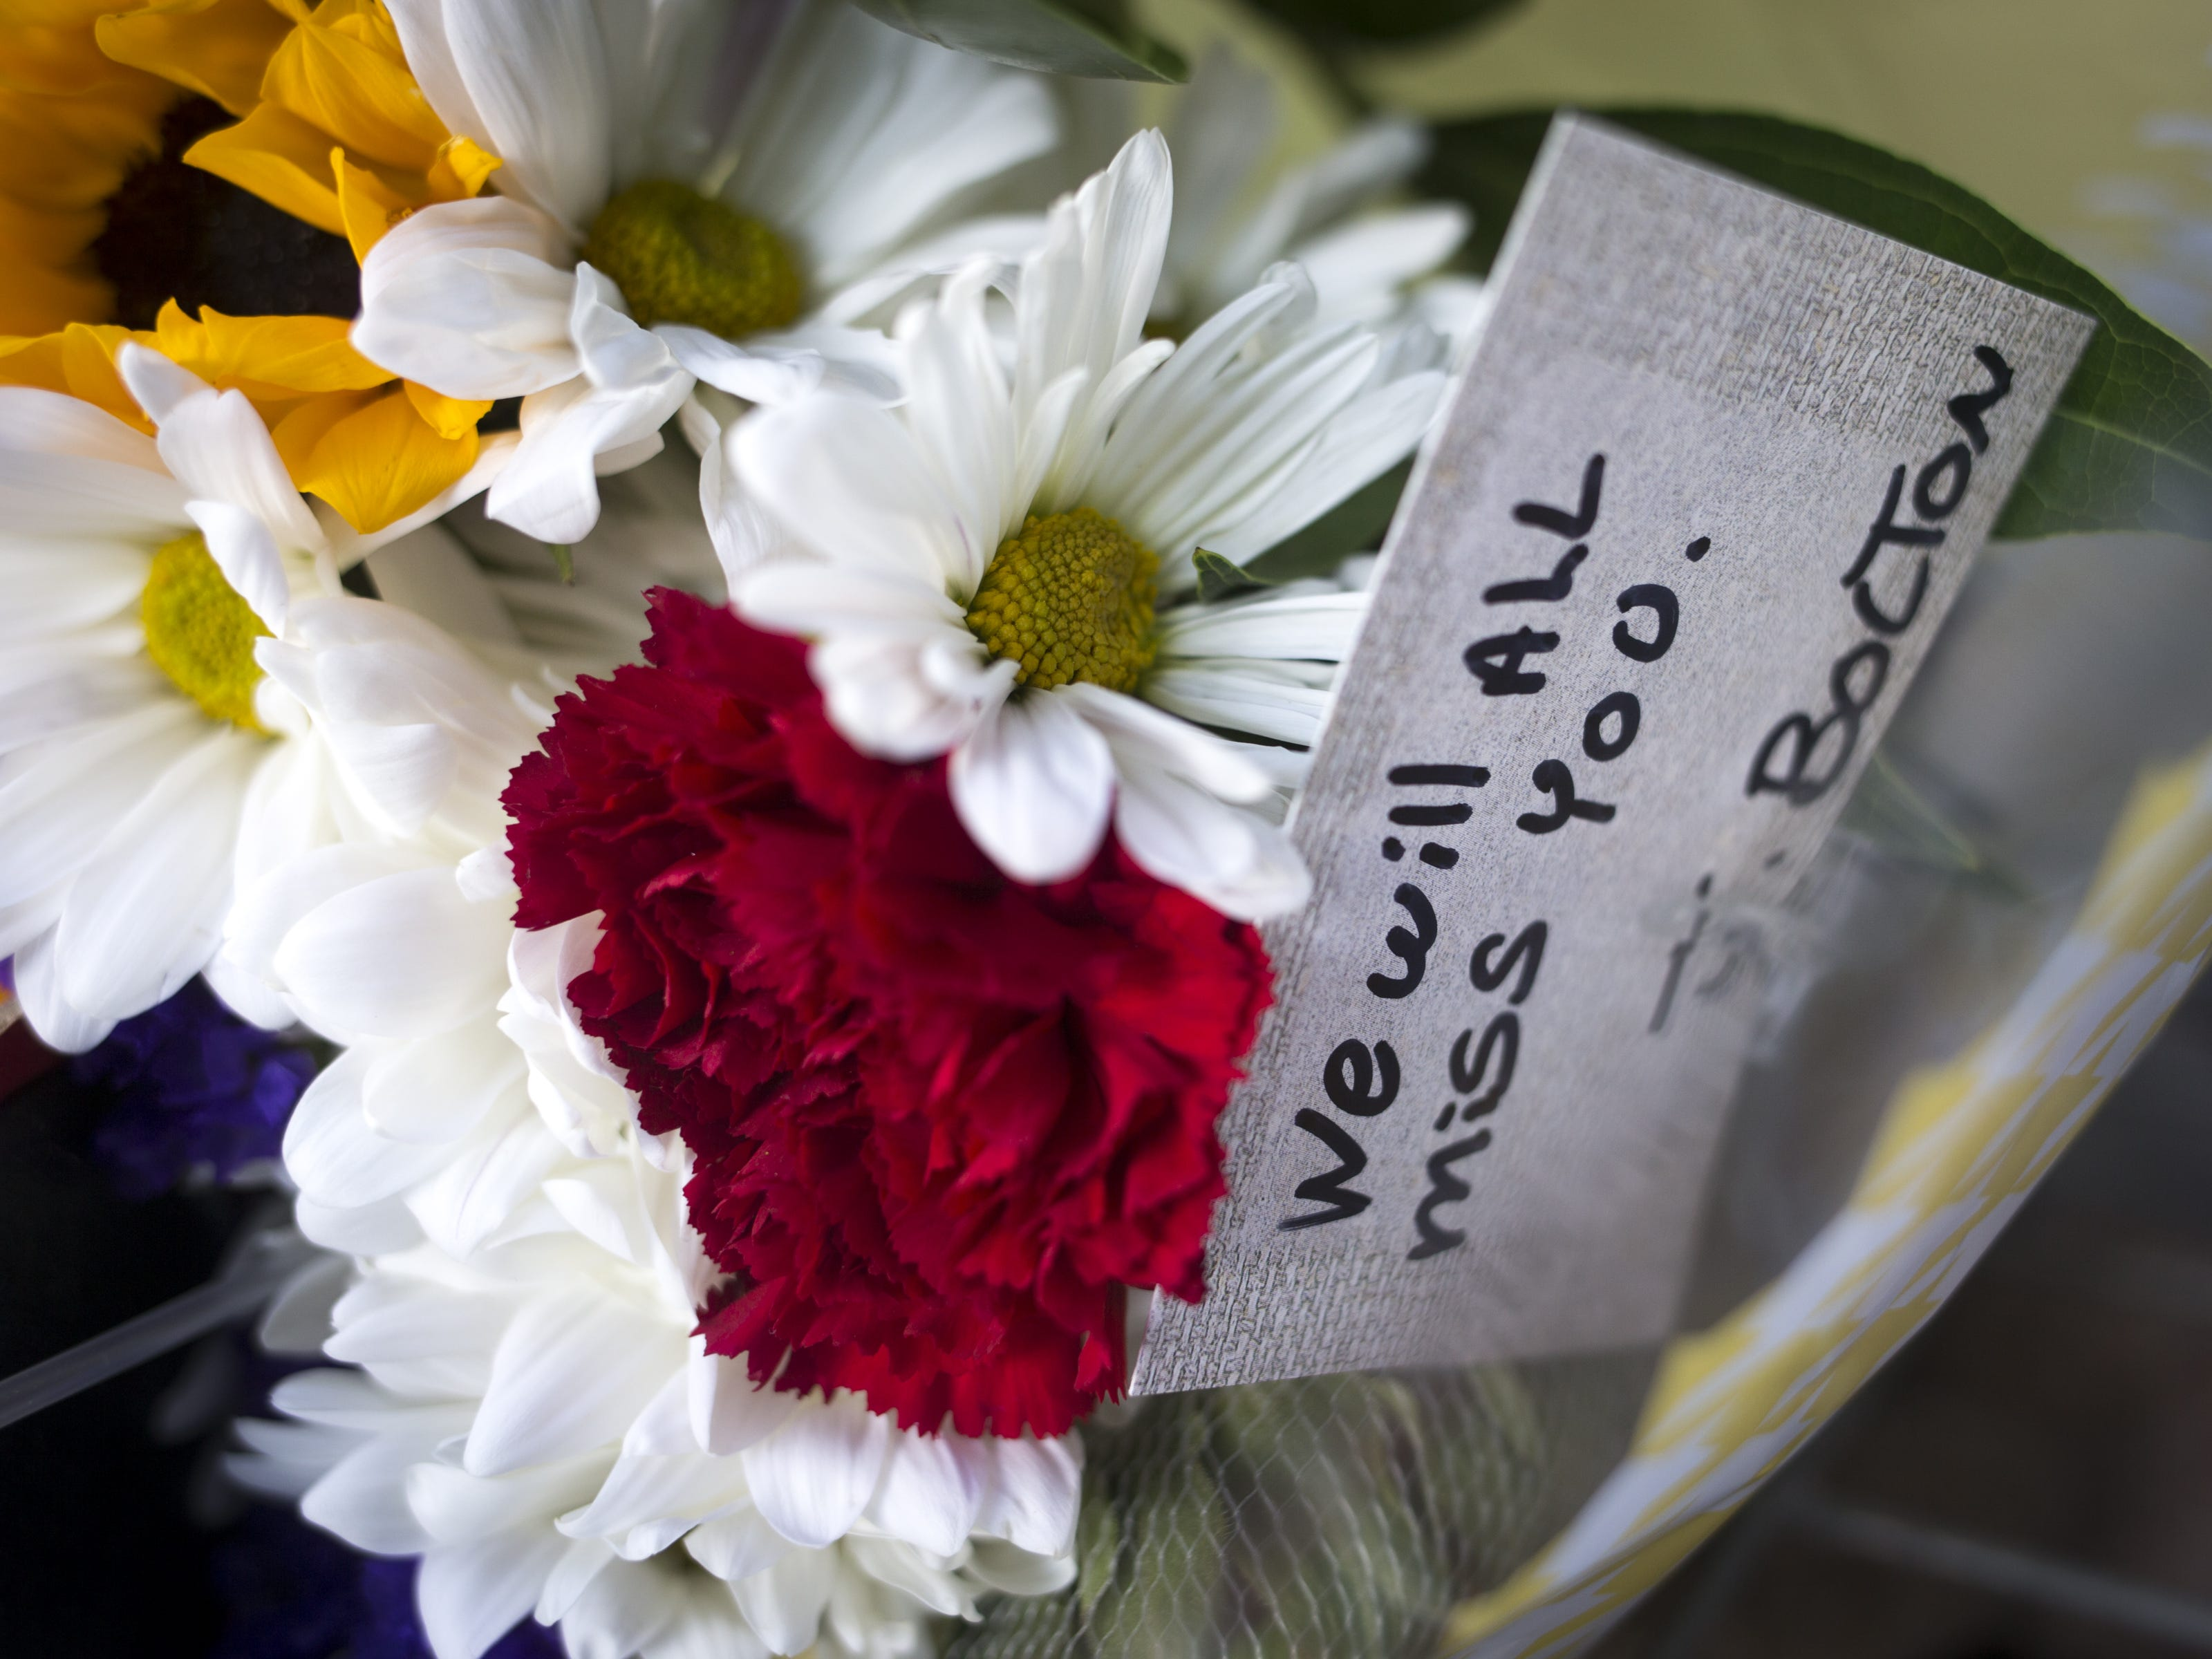 James Bolton left cards and flowers at the makeshift memorial outside Sen. John McCain's office on Aug. 26, 2018, in Phoenix.